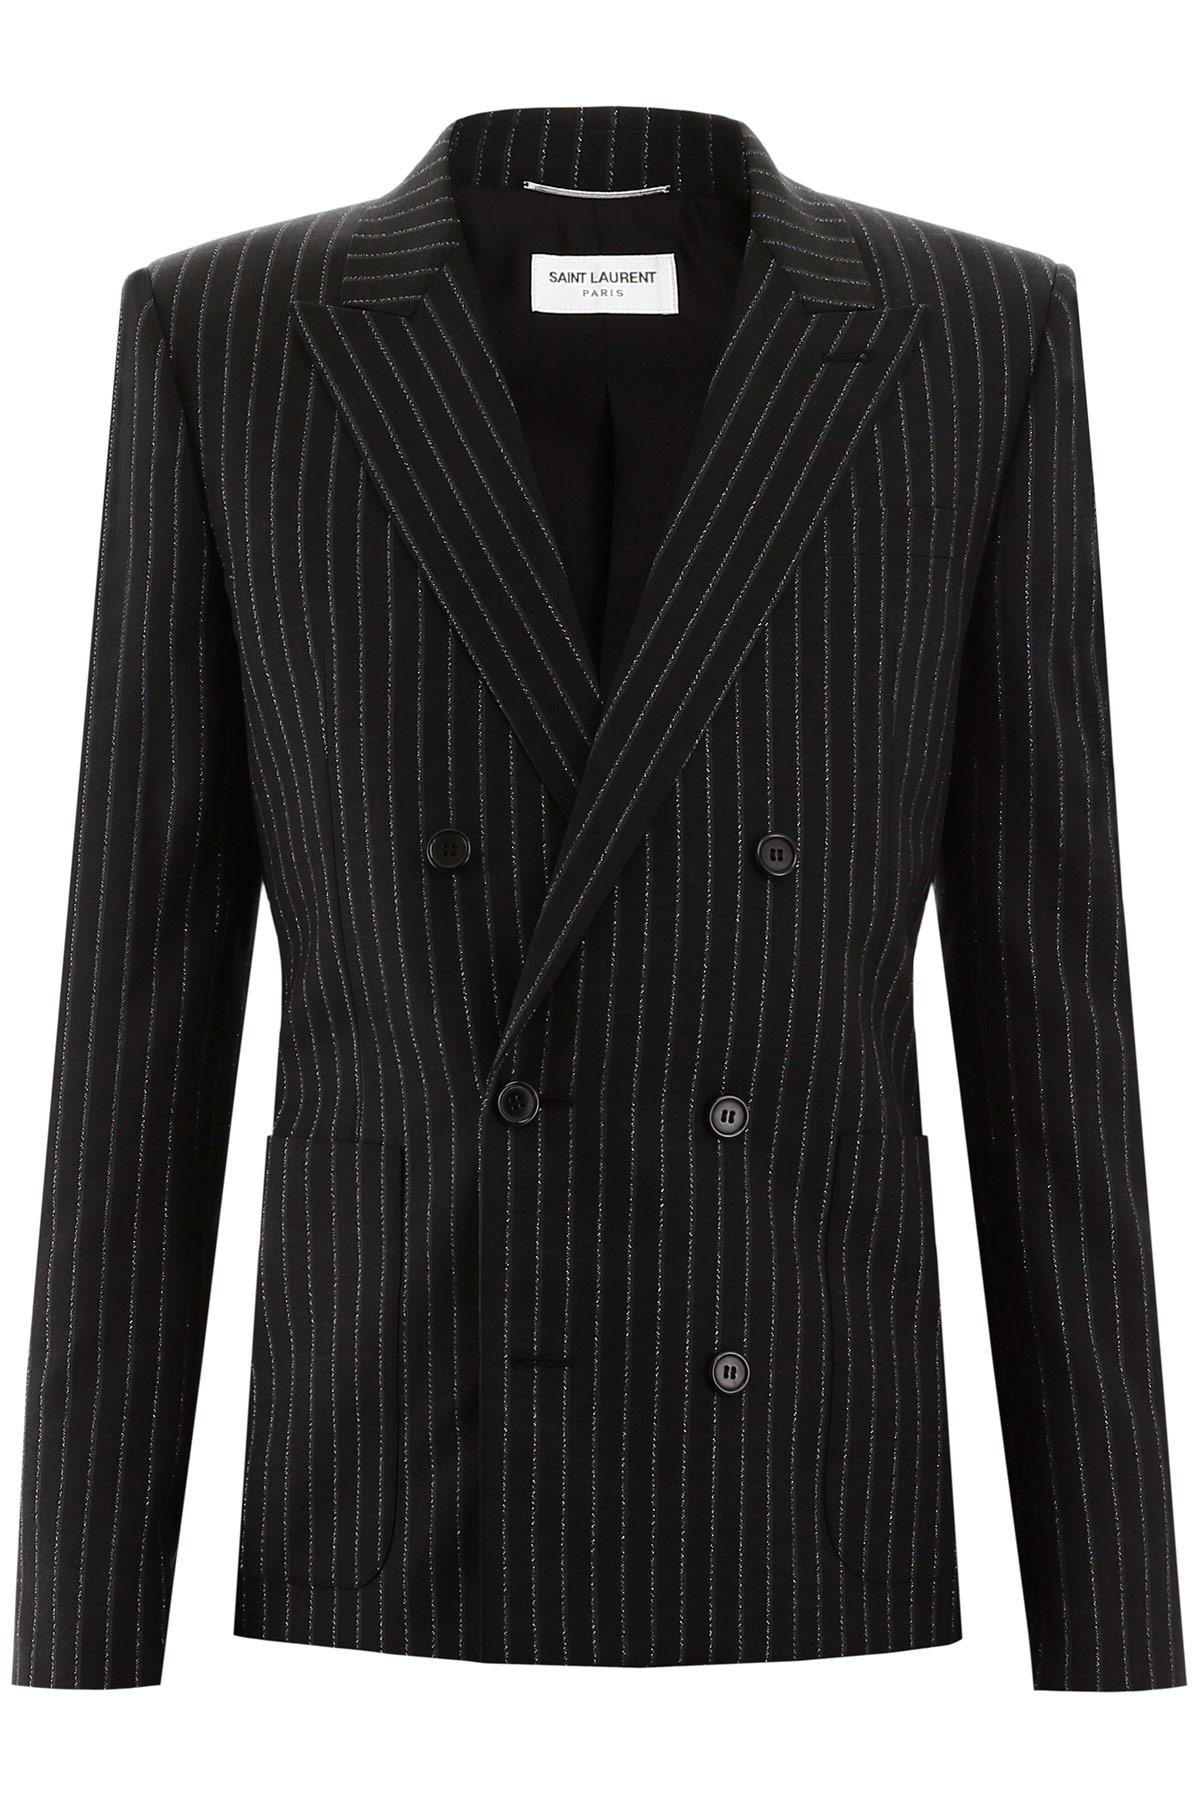 SAINT LAURENT PINSTRIPE BLAZER 50 Black, Silver Wool